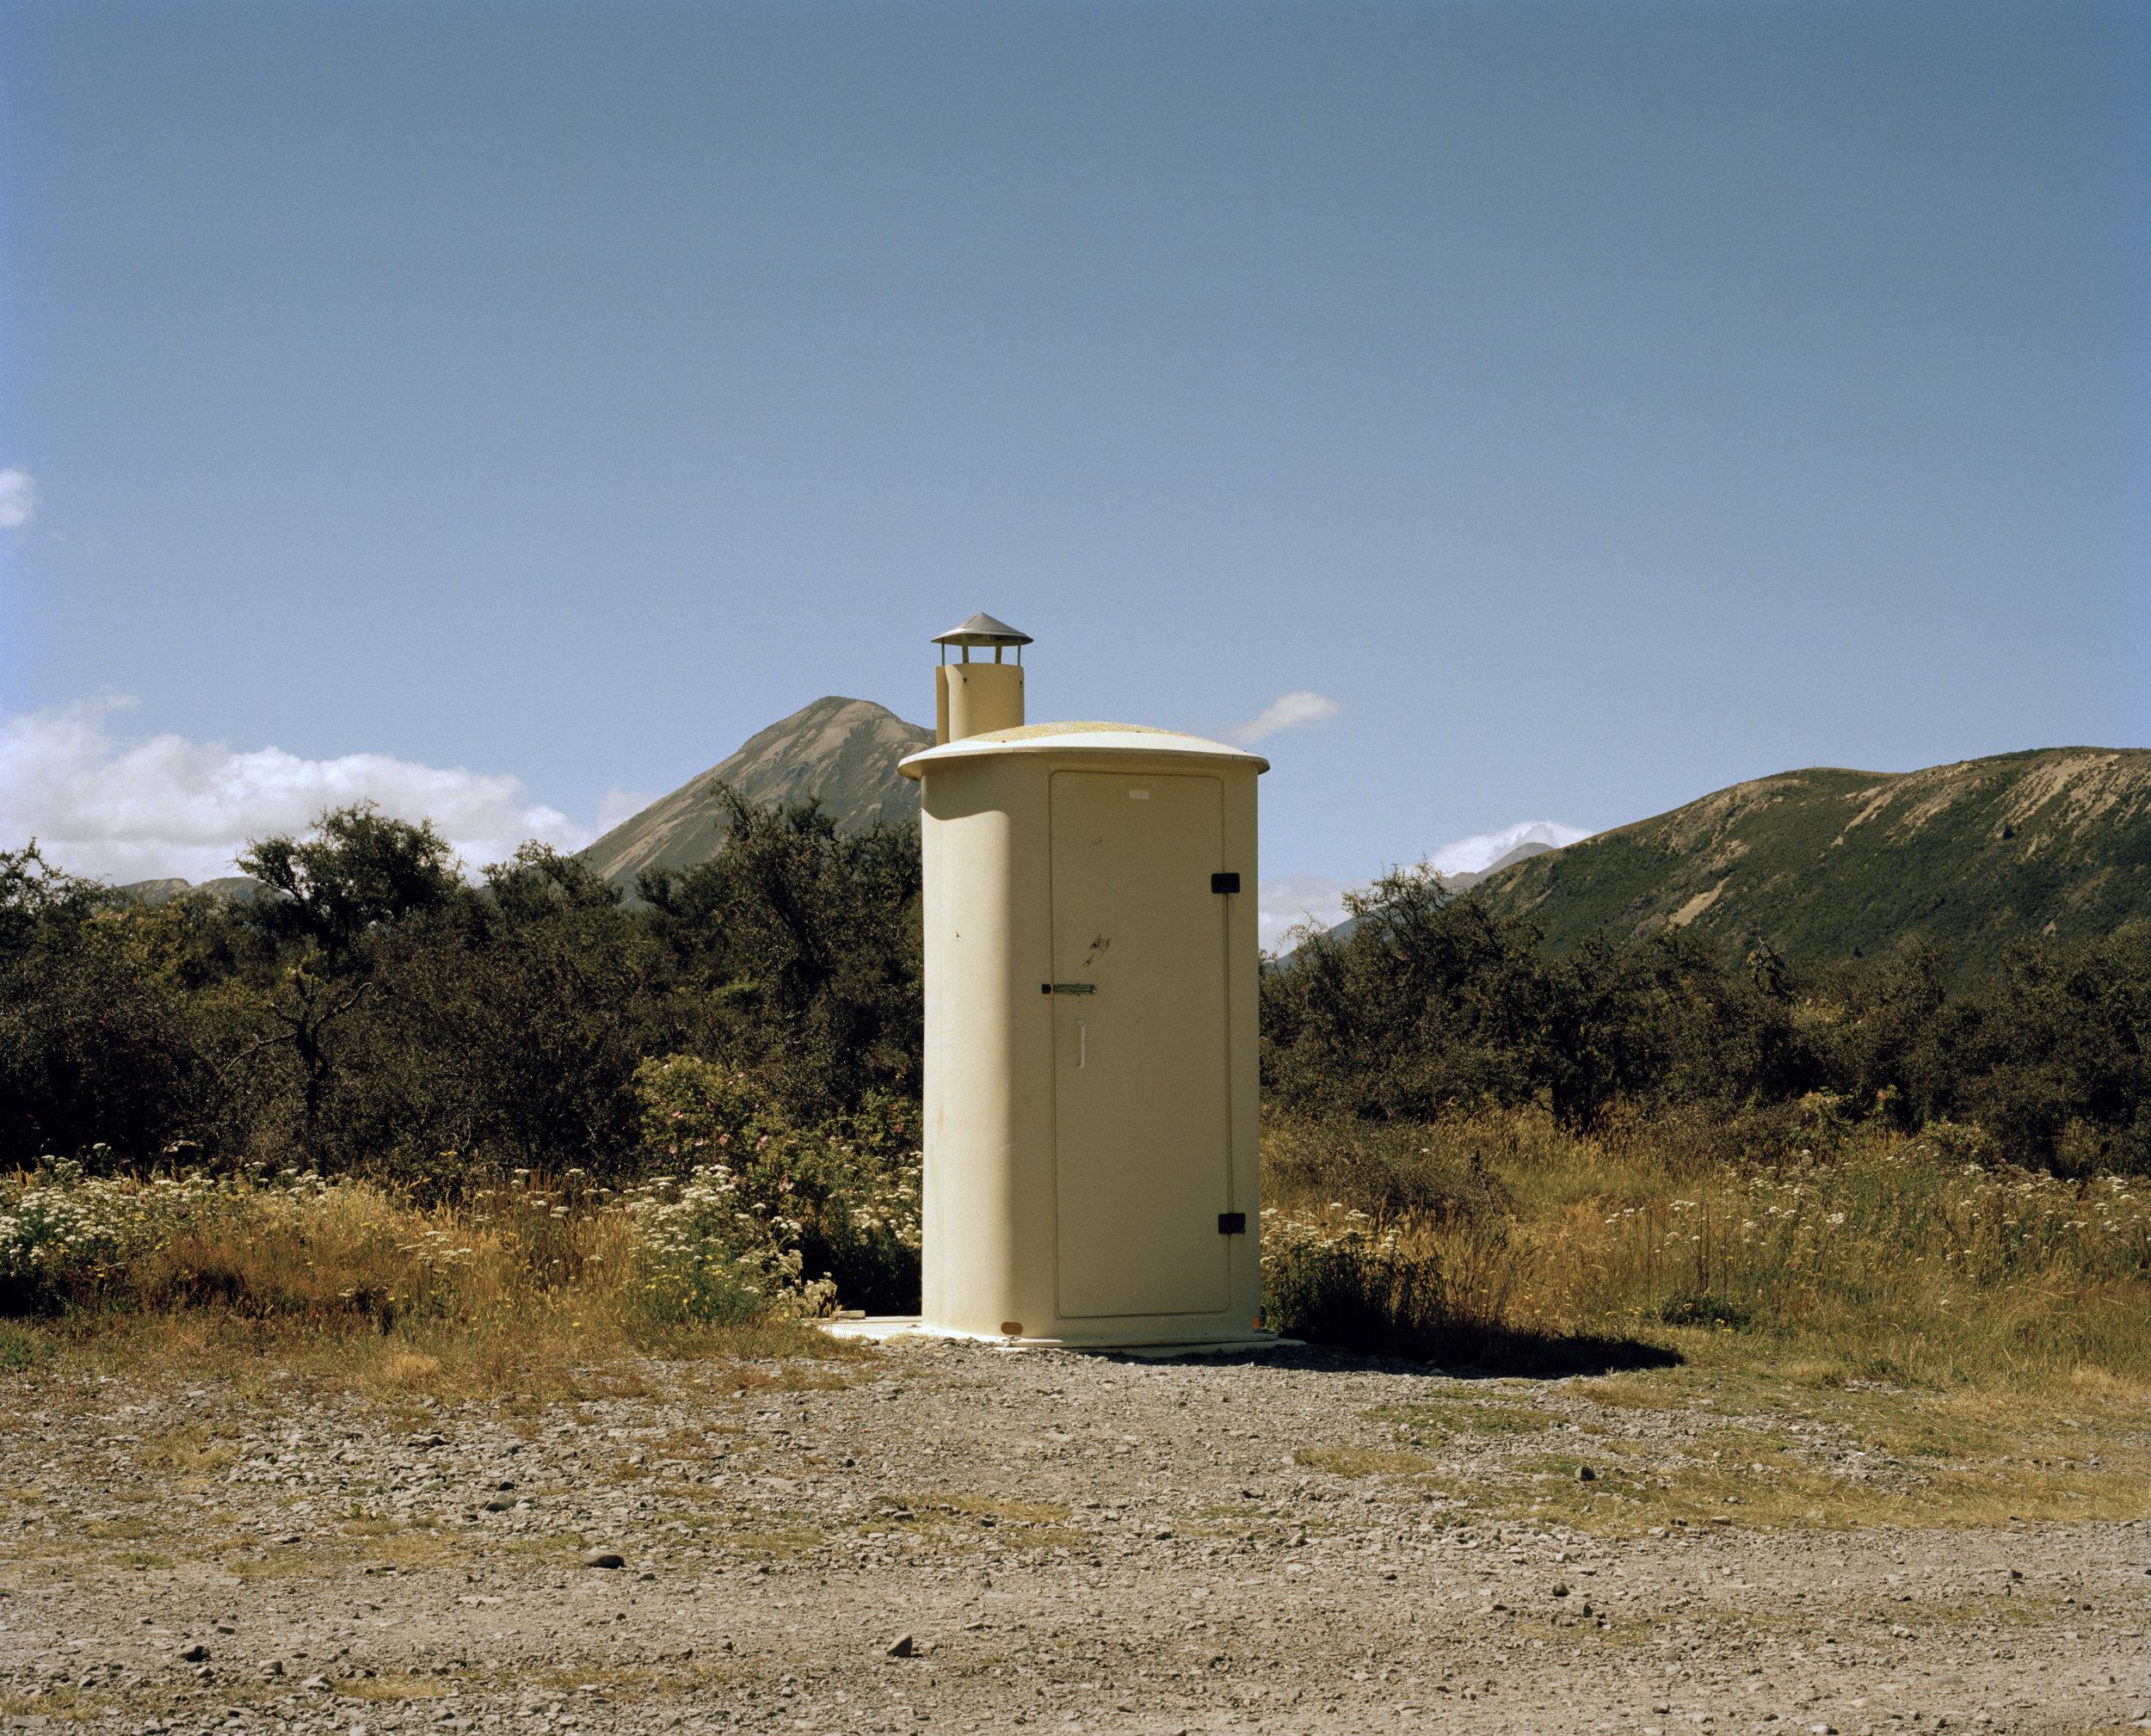 Moana Rua Wildlife Refuge, Great Alpine Highway, 2013